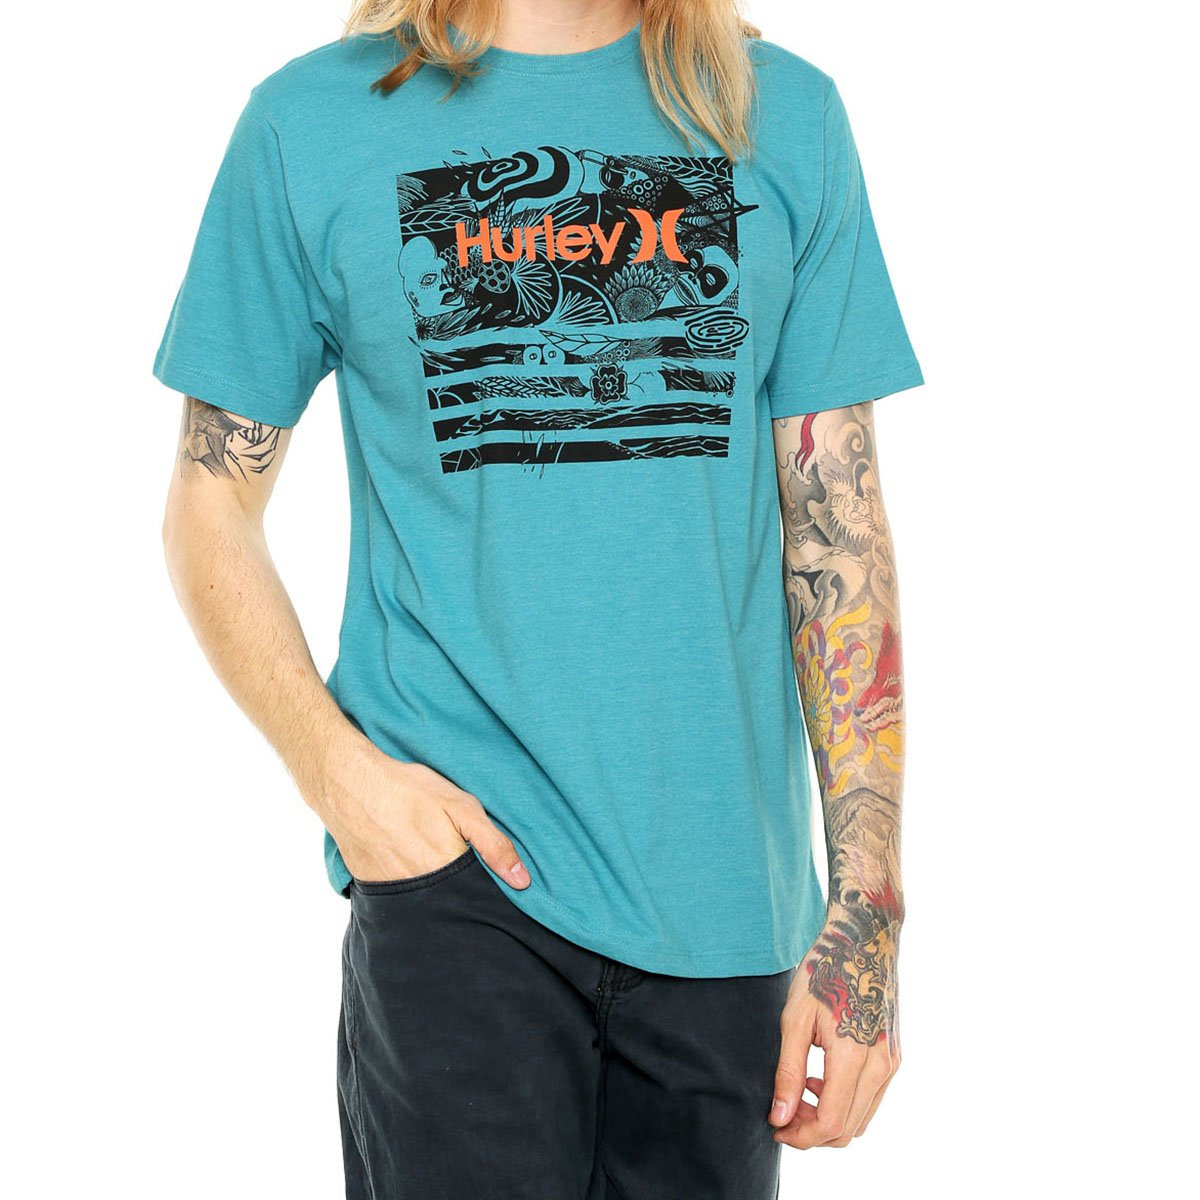 Camiseta Hurley Atmosphere Masculina - Azul